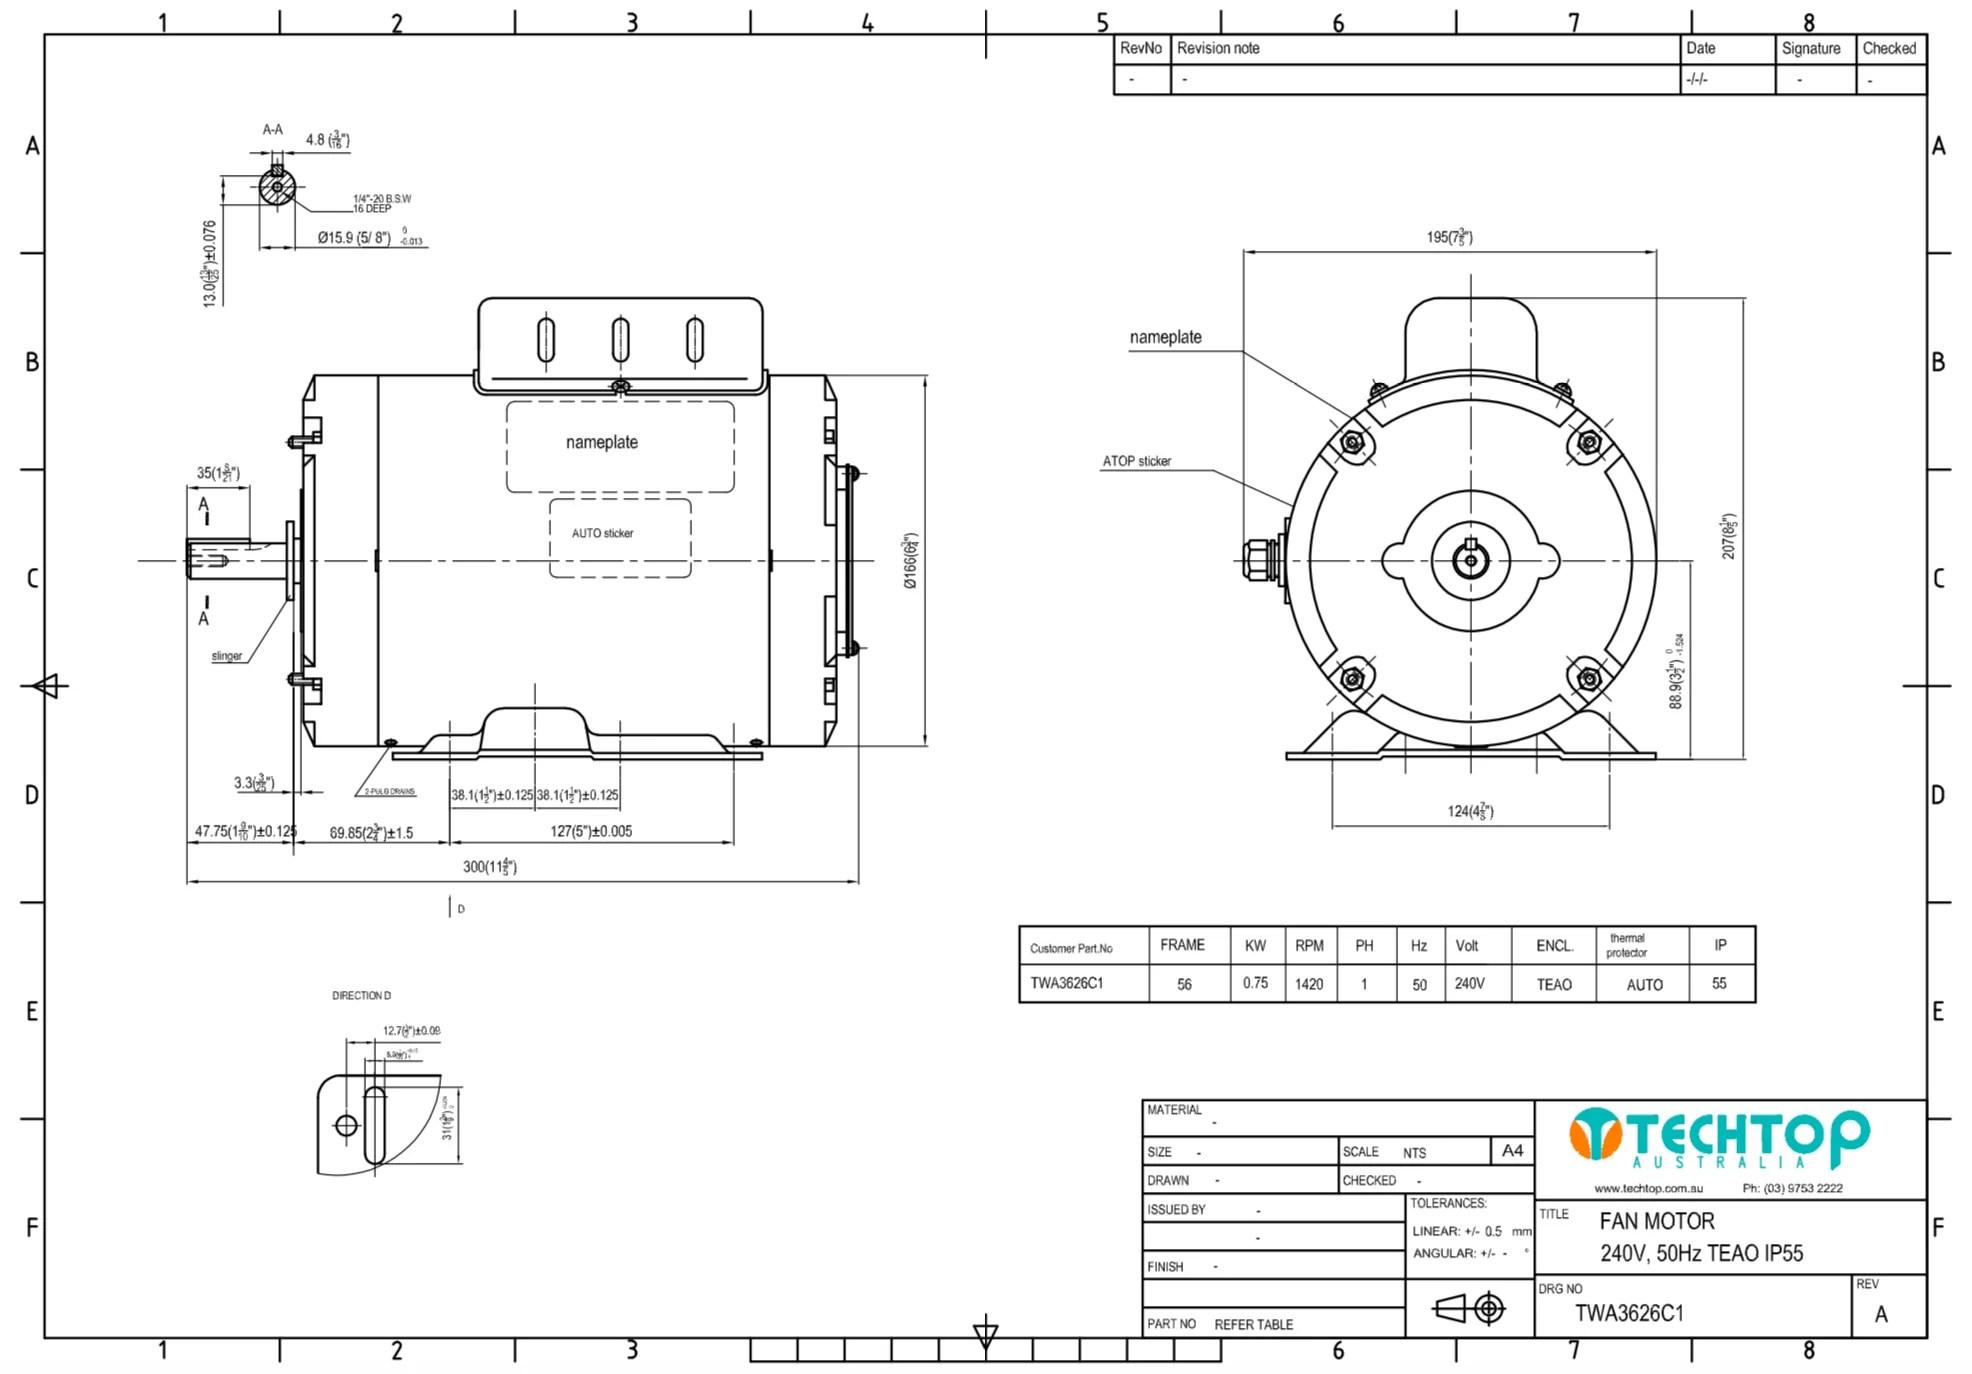 fan motor 0 75kw 1420rpm 240volt single phase psc 5 8 shaft teaom ip55 reversible [ 1972 x 1374 Pixel ]